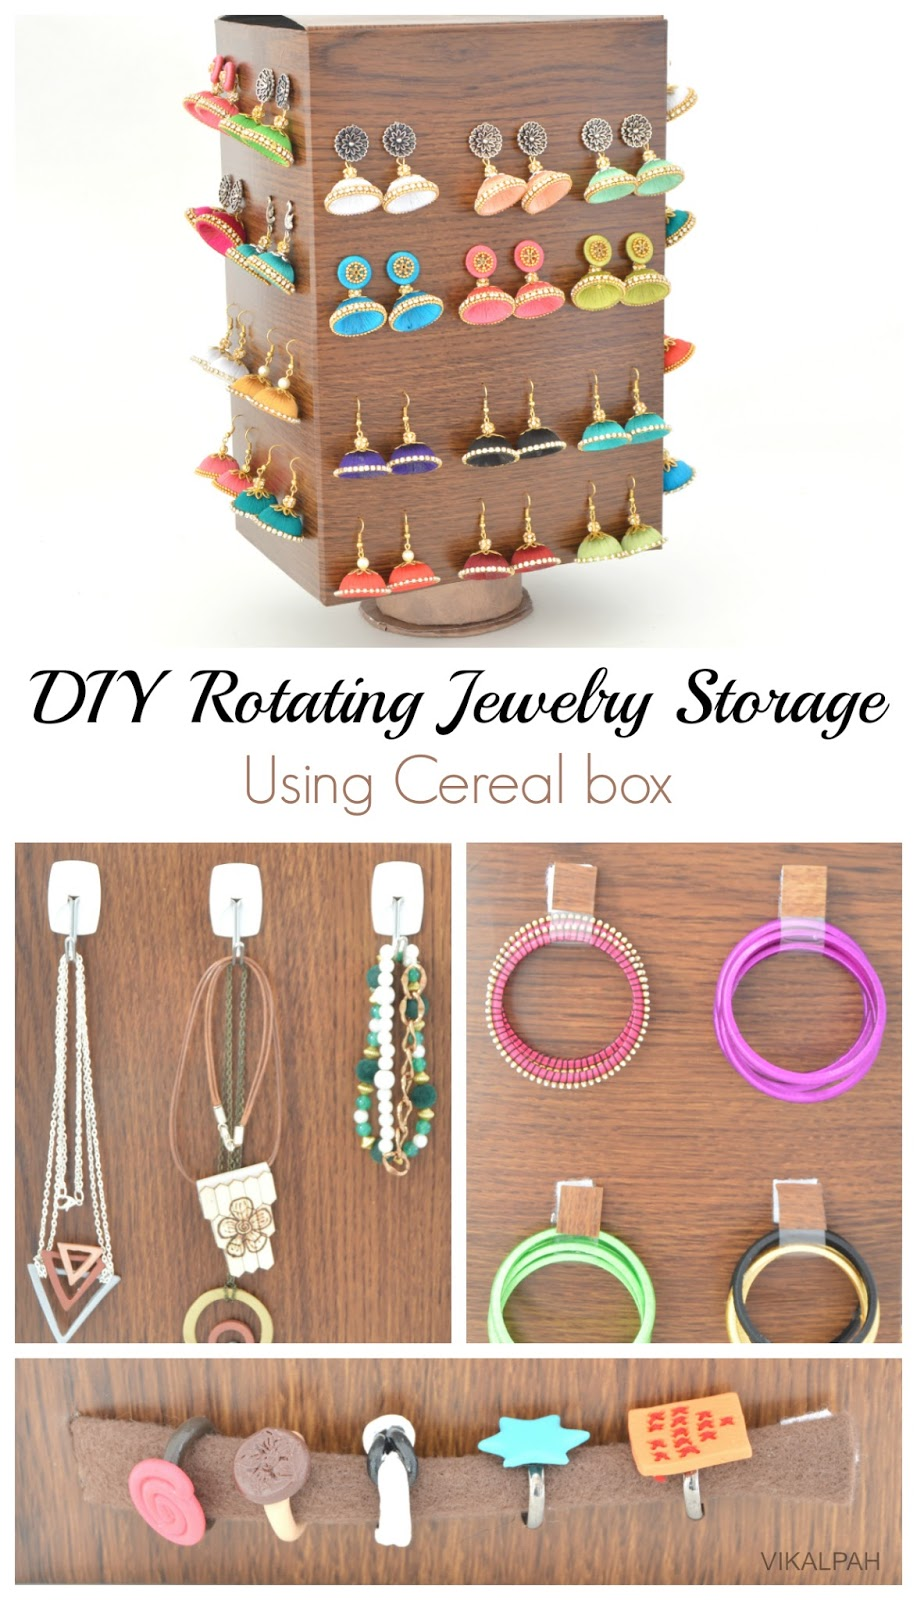 Vikalpah diy rotating jewelry storage using cereal box for Diy cereal box